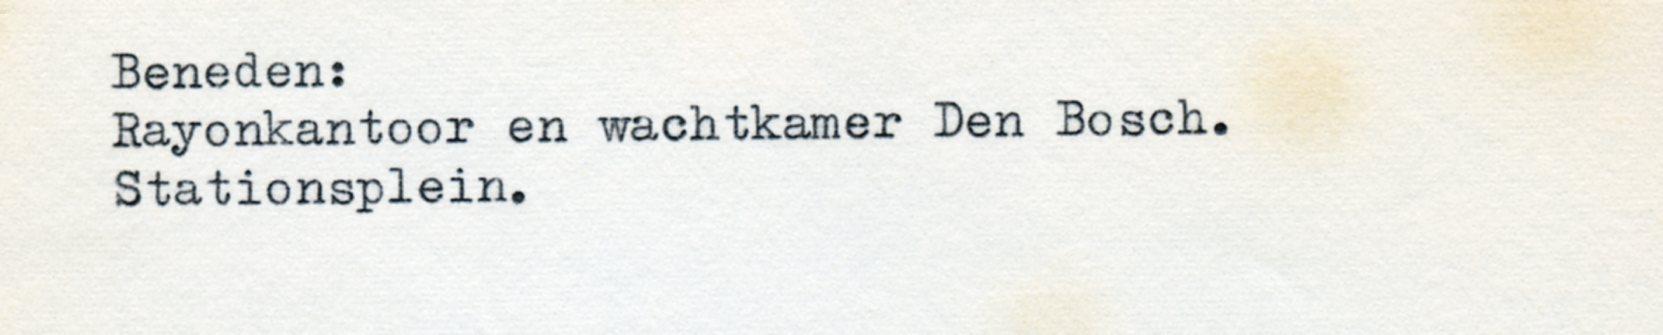 Den-Bosch-Rayon-wachtkamer